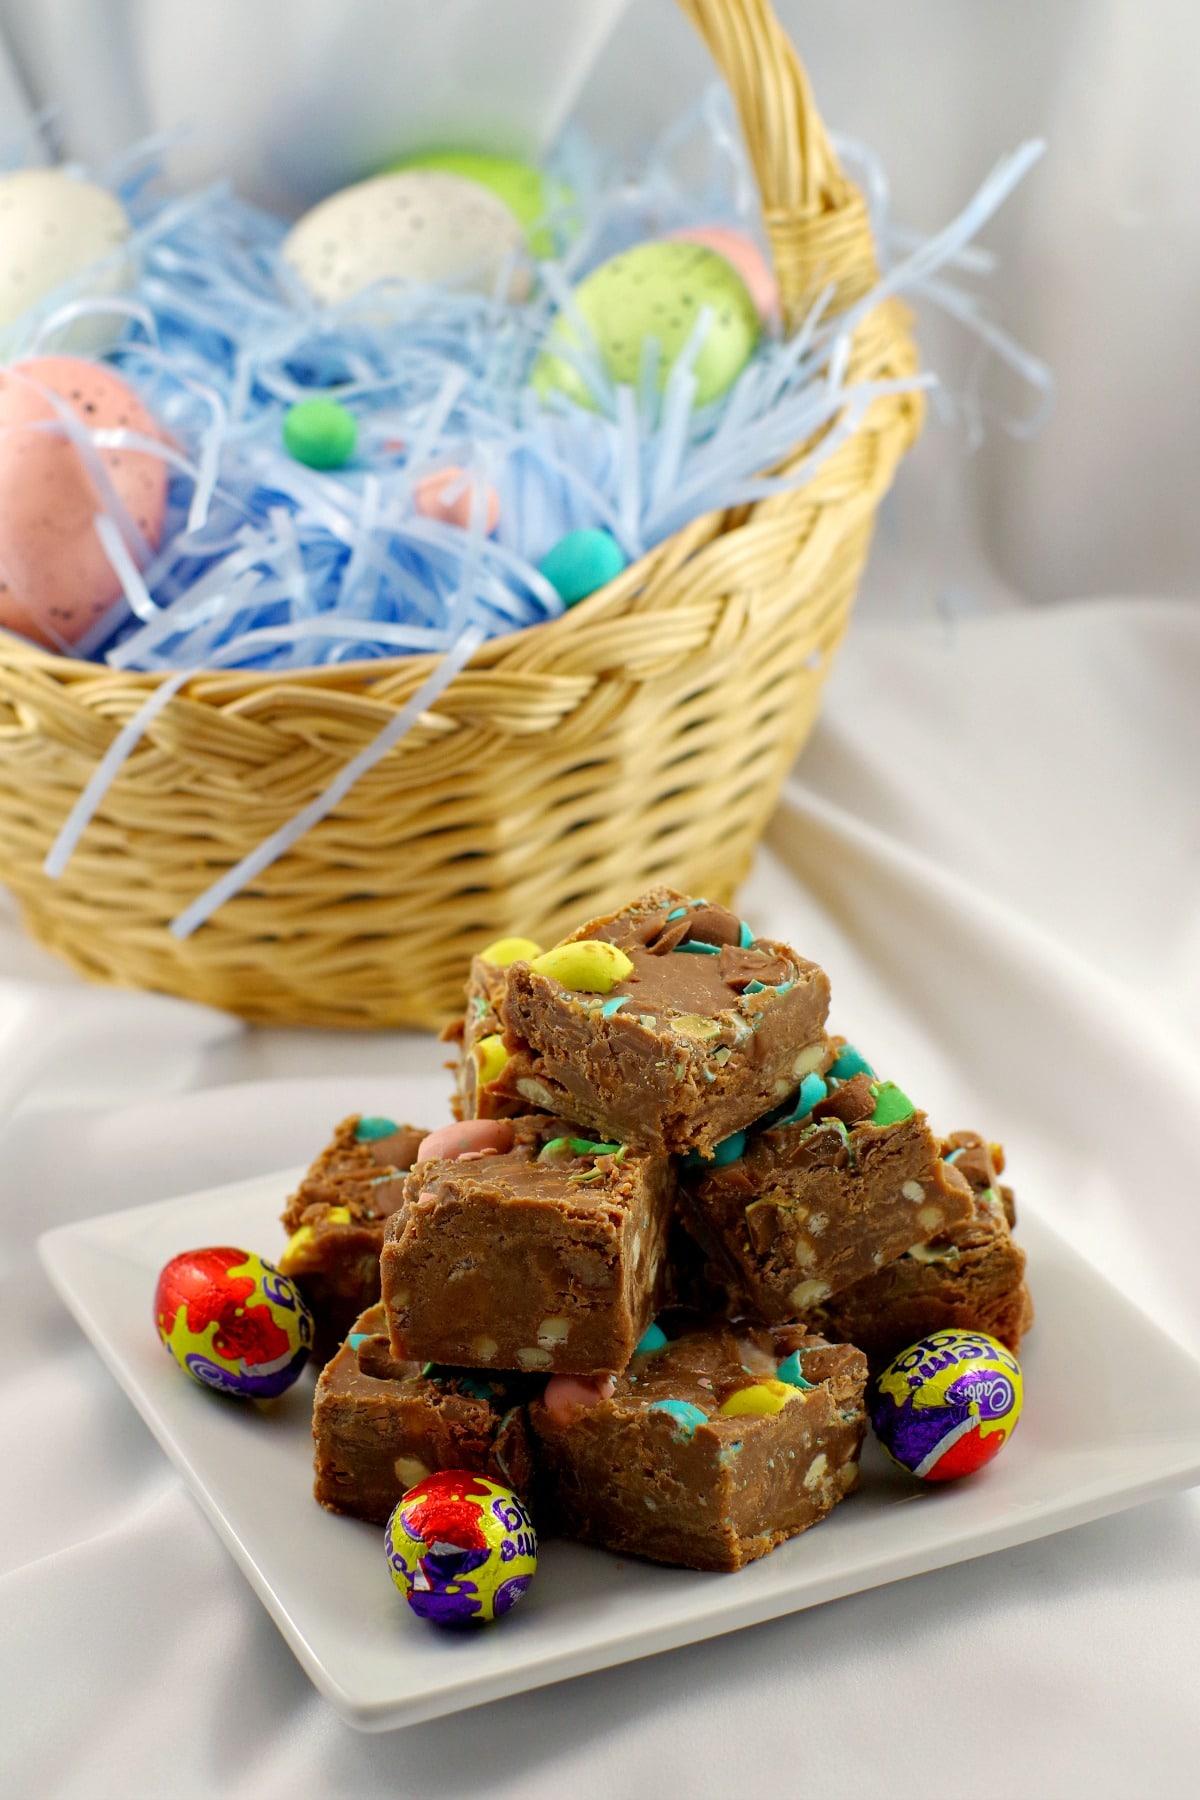 Fudge stacked in front of Easter egg basket